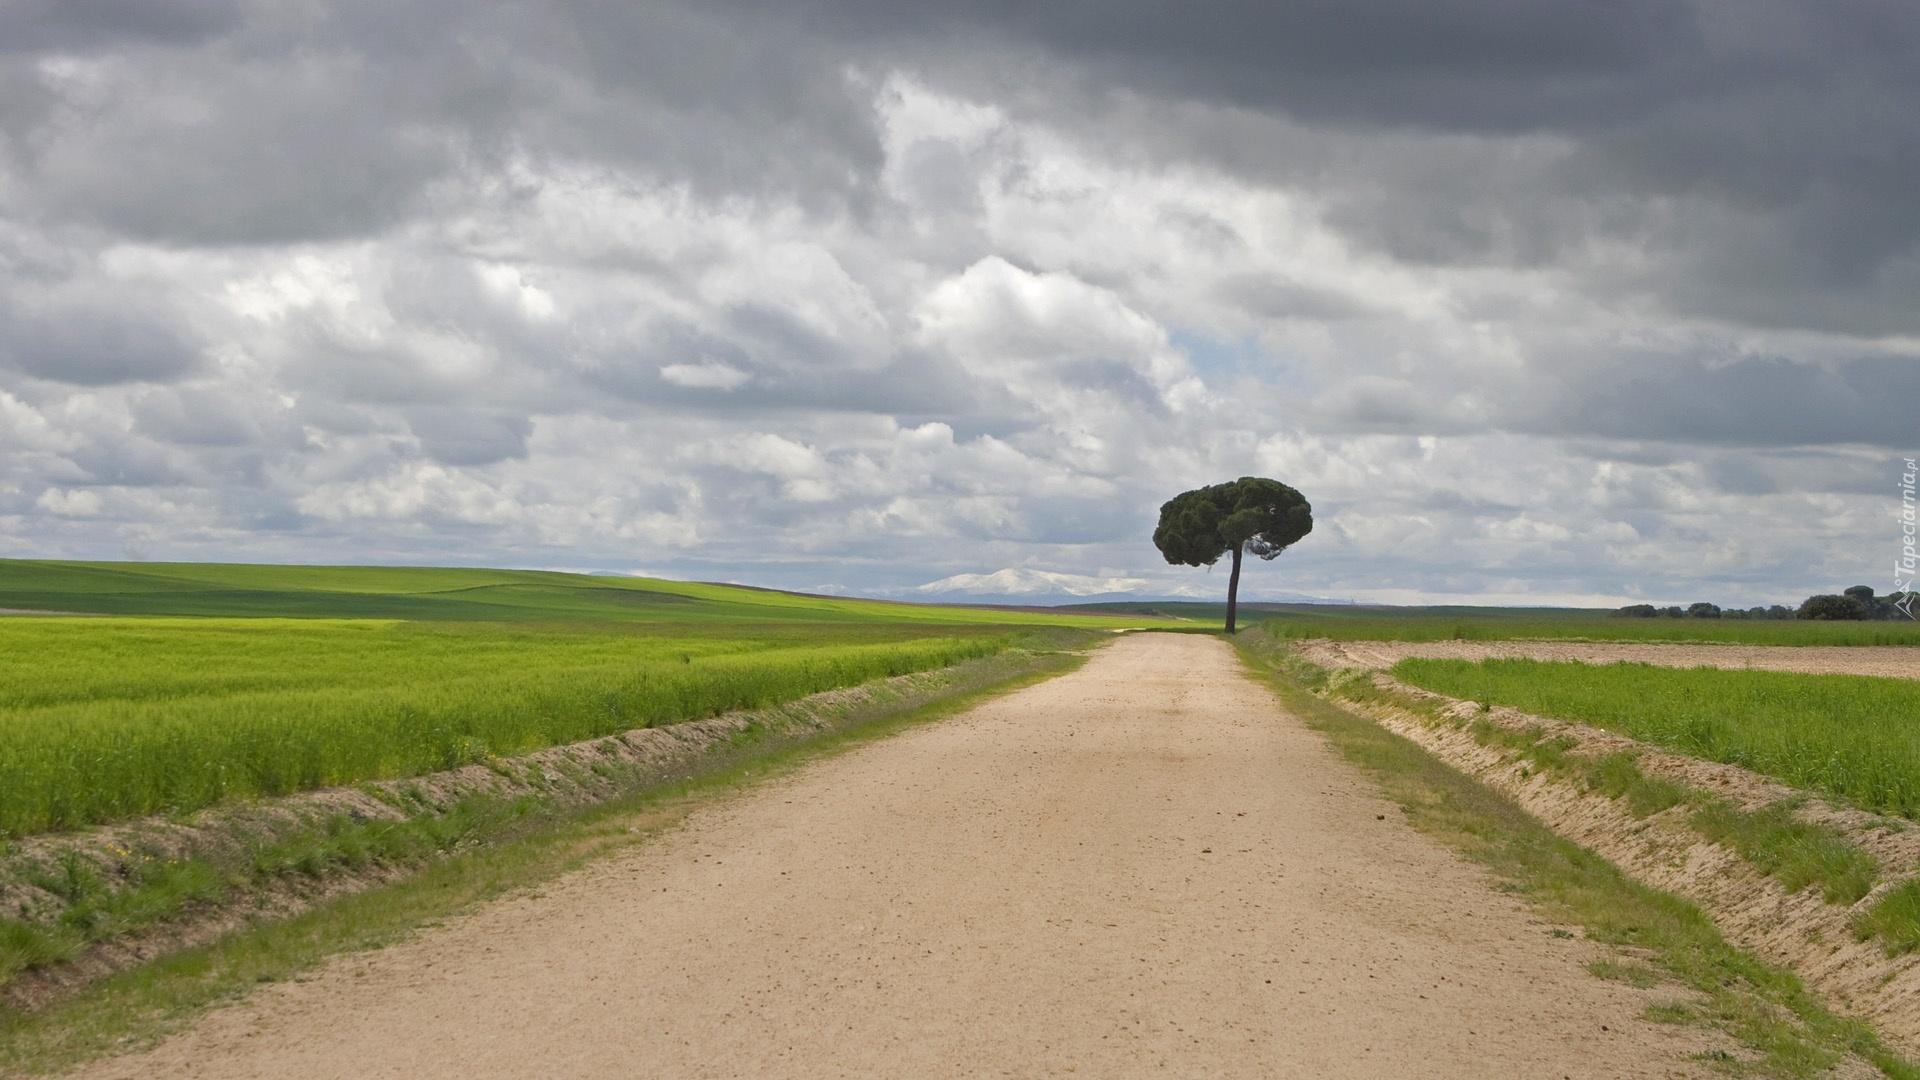 Hd Birthday Wallpapers 1080p Droga Pole Chmury Drzewo